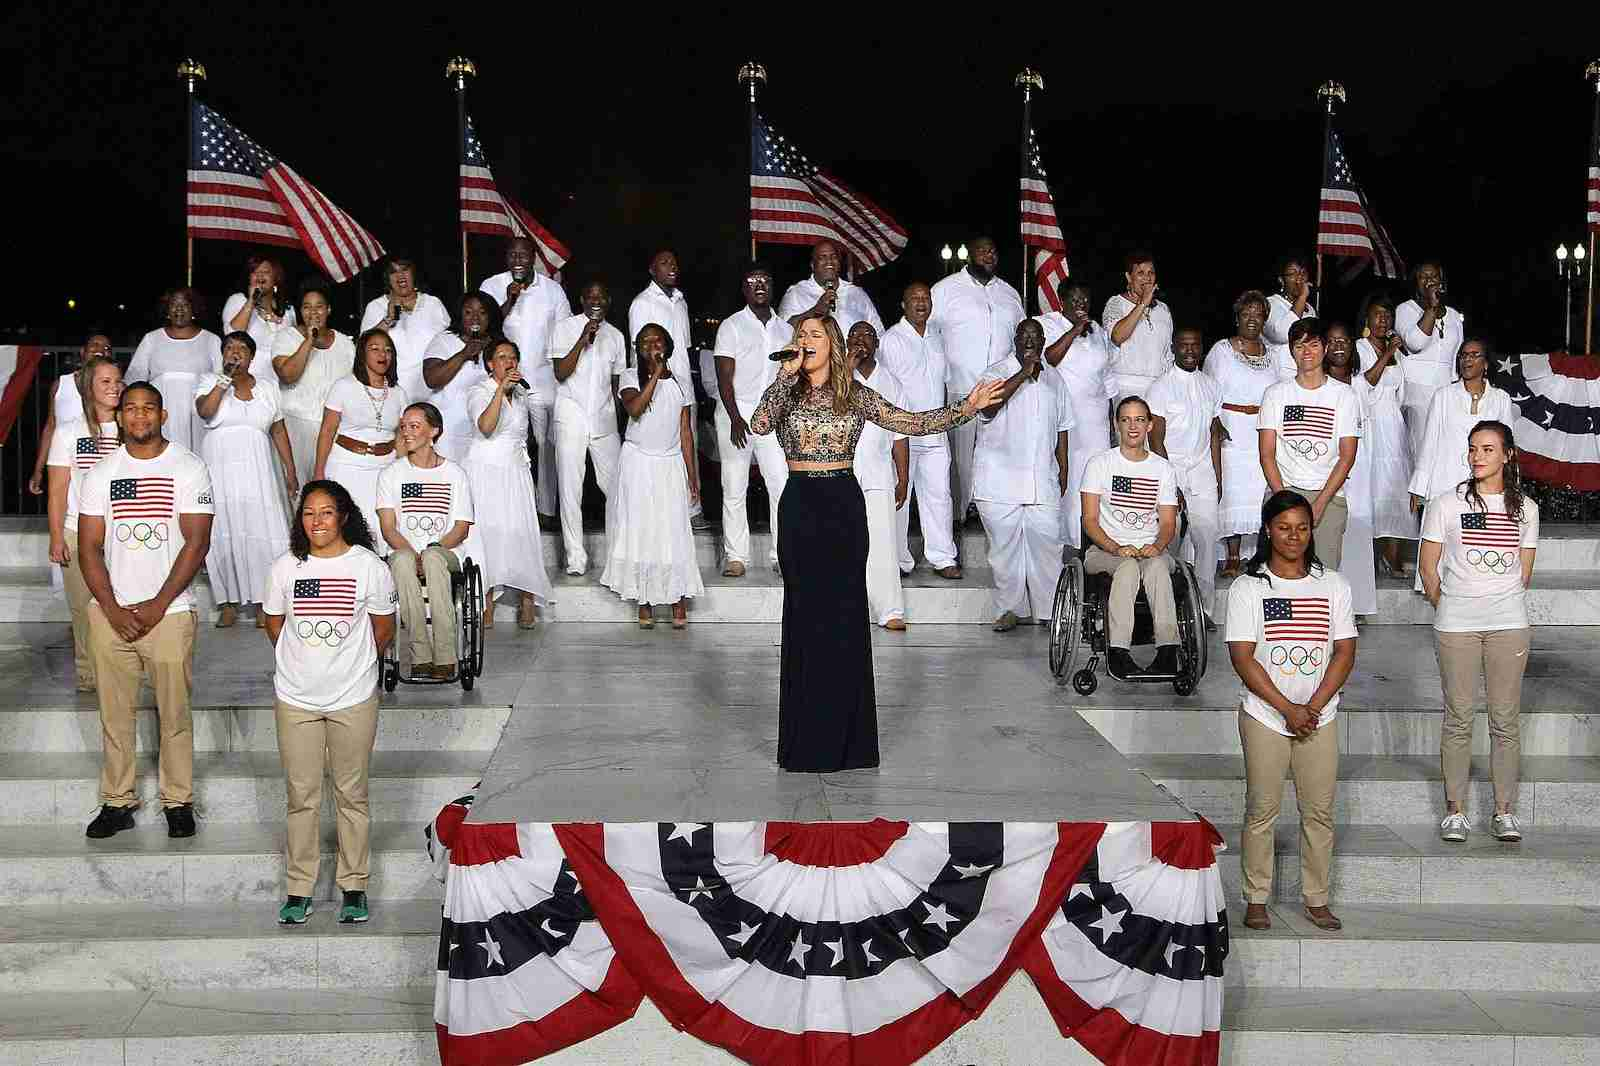 Capital Fourth July 4, 2016Cassadee Pope